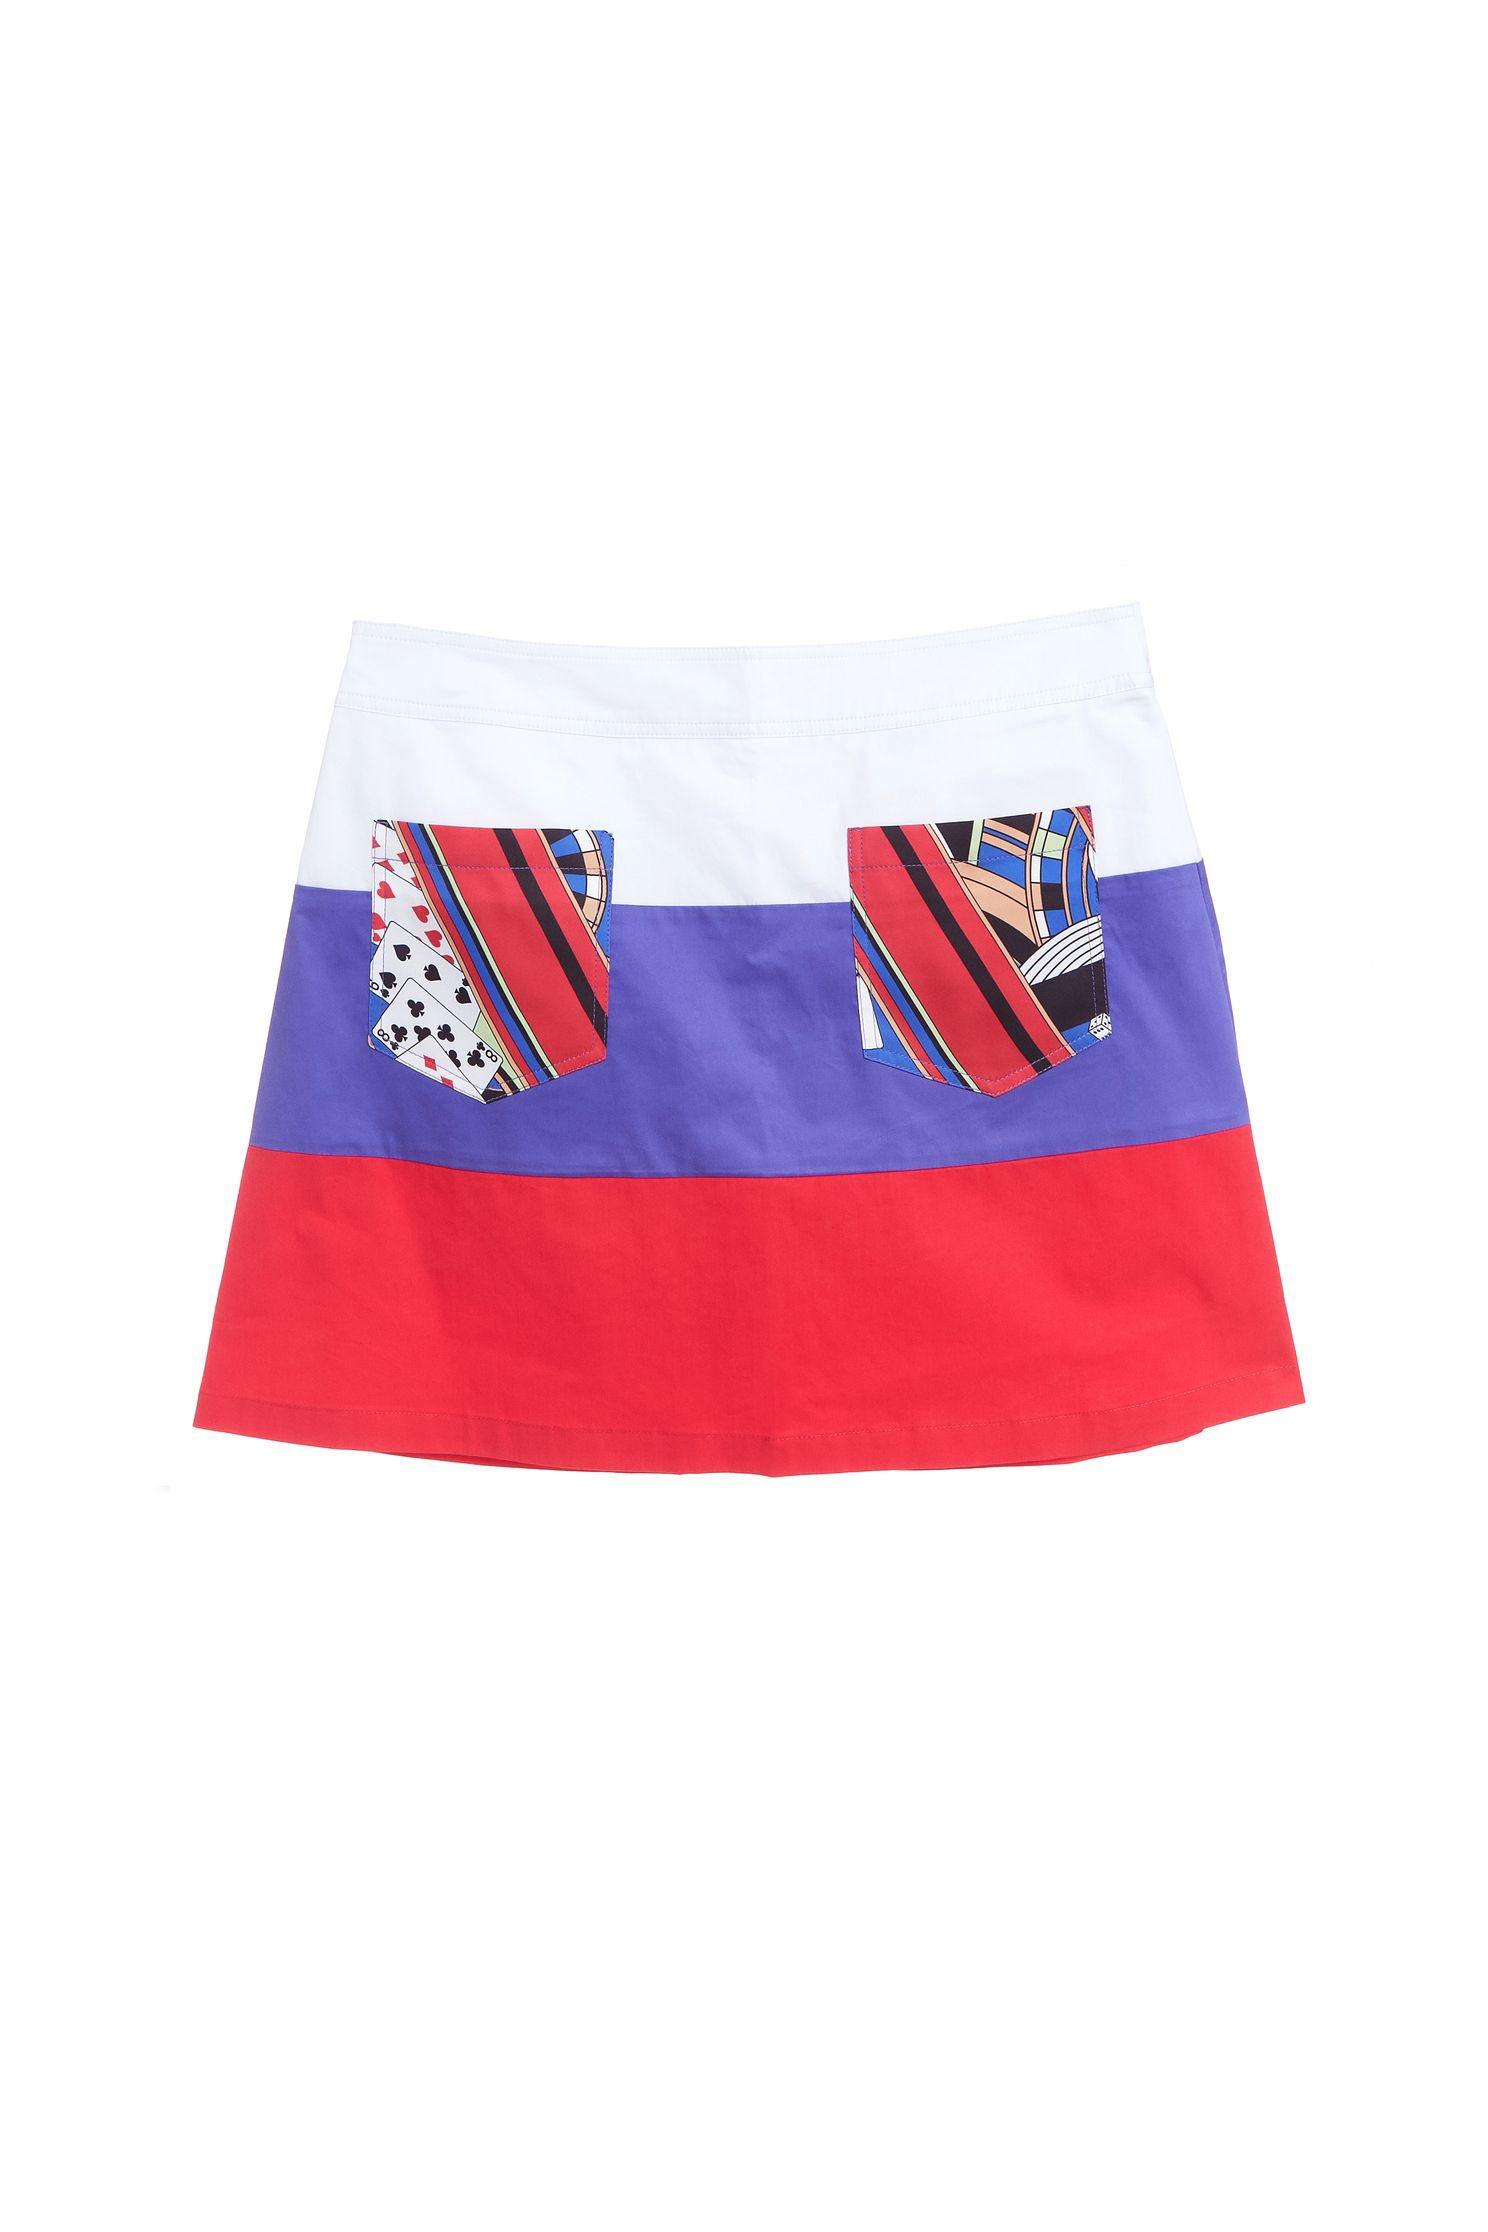 Color matching fashion design skirt